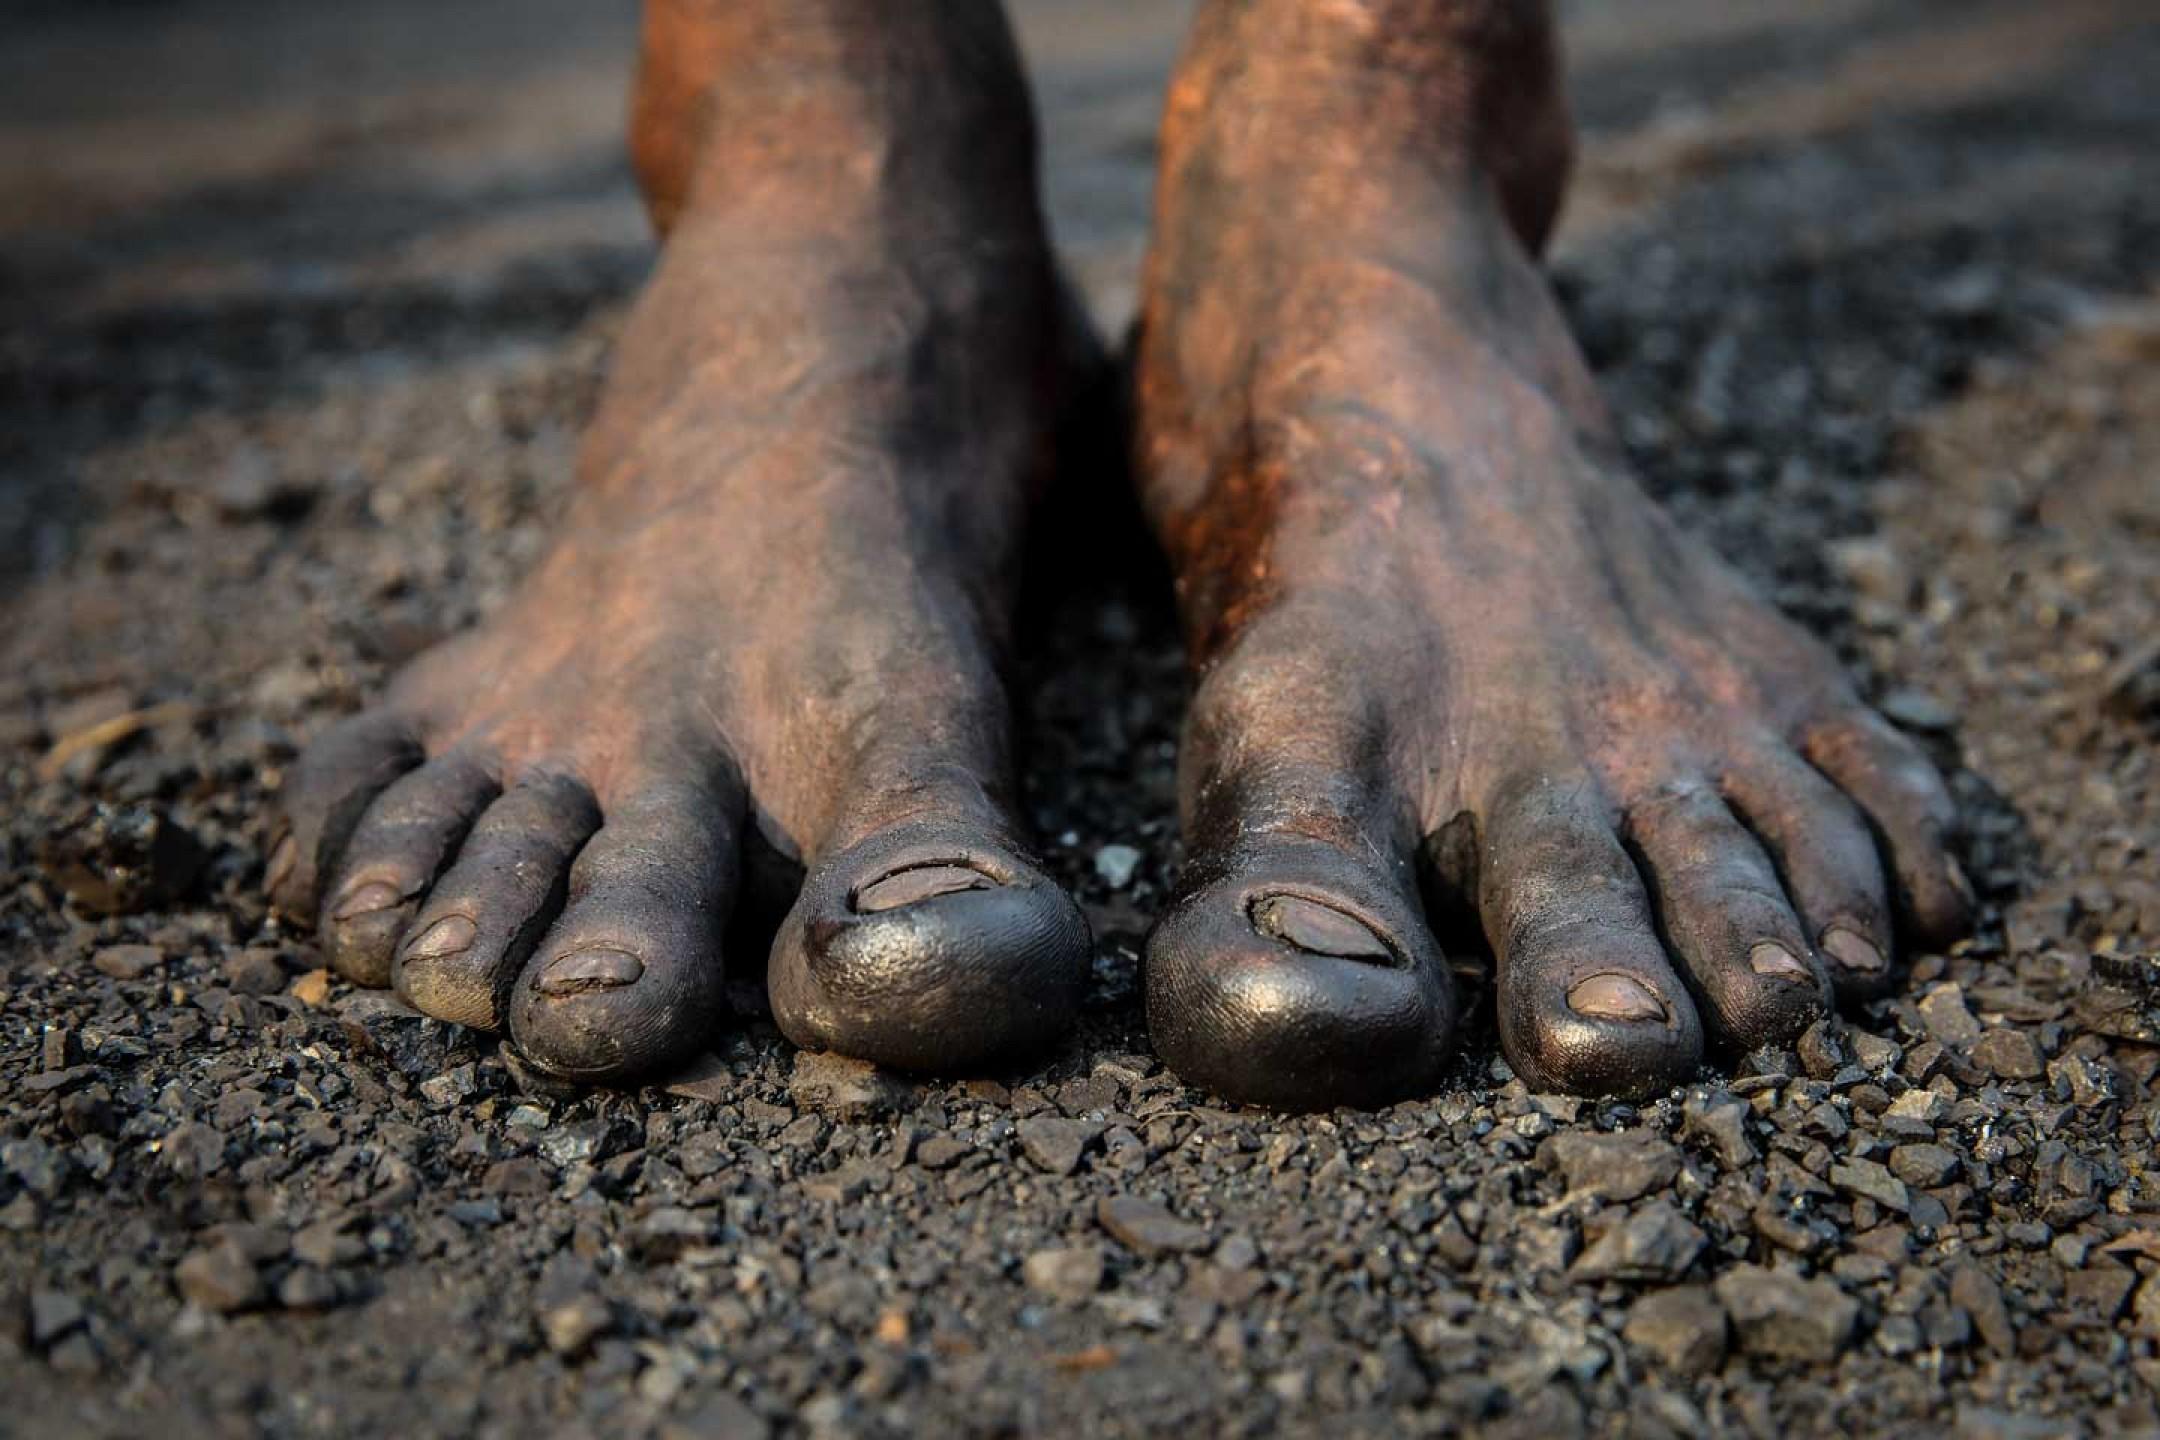 Feet tells stories.